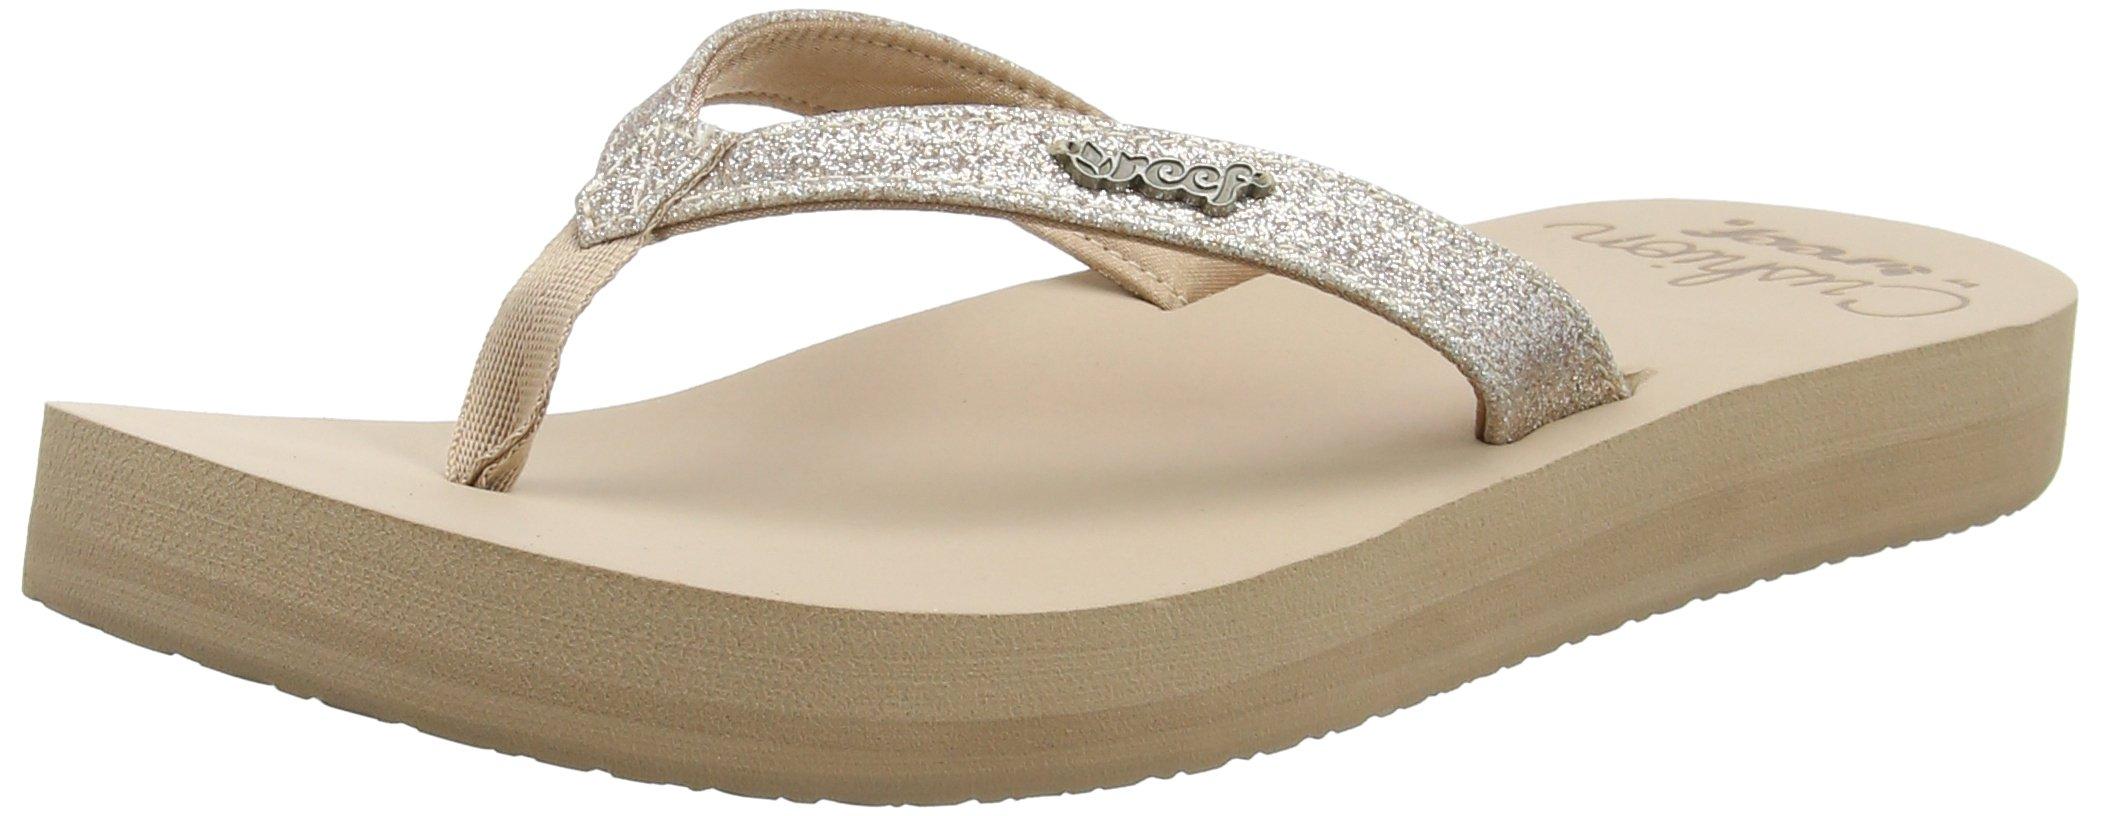 REEF Women's Sandals Star Cushion | Fashion Flip Flops for Women